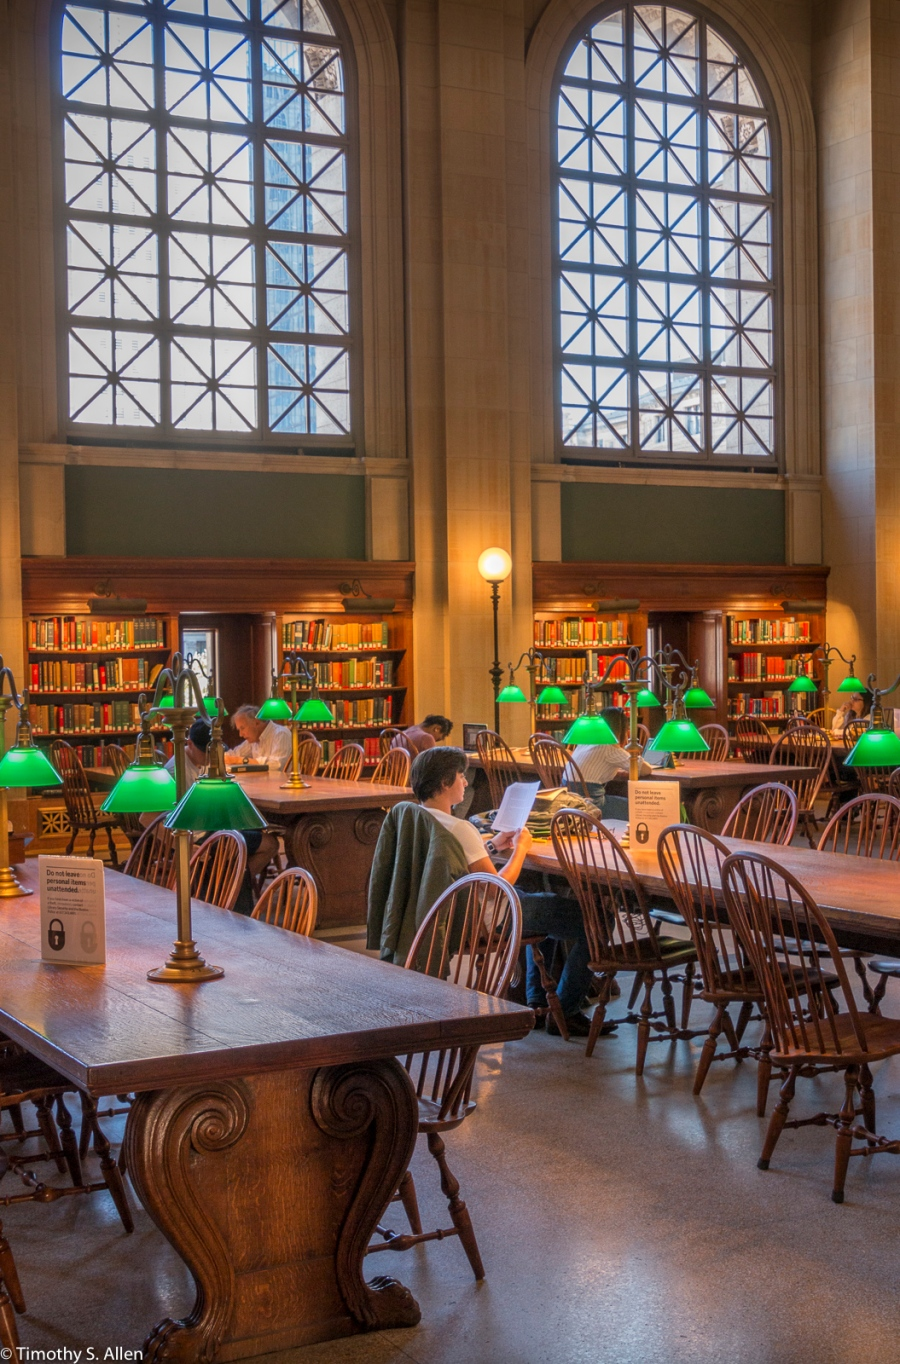 Boston Public Library Reading Room - Boston, MA., U.S.A. September 5, 2016